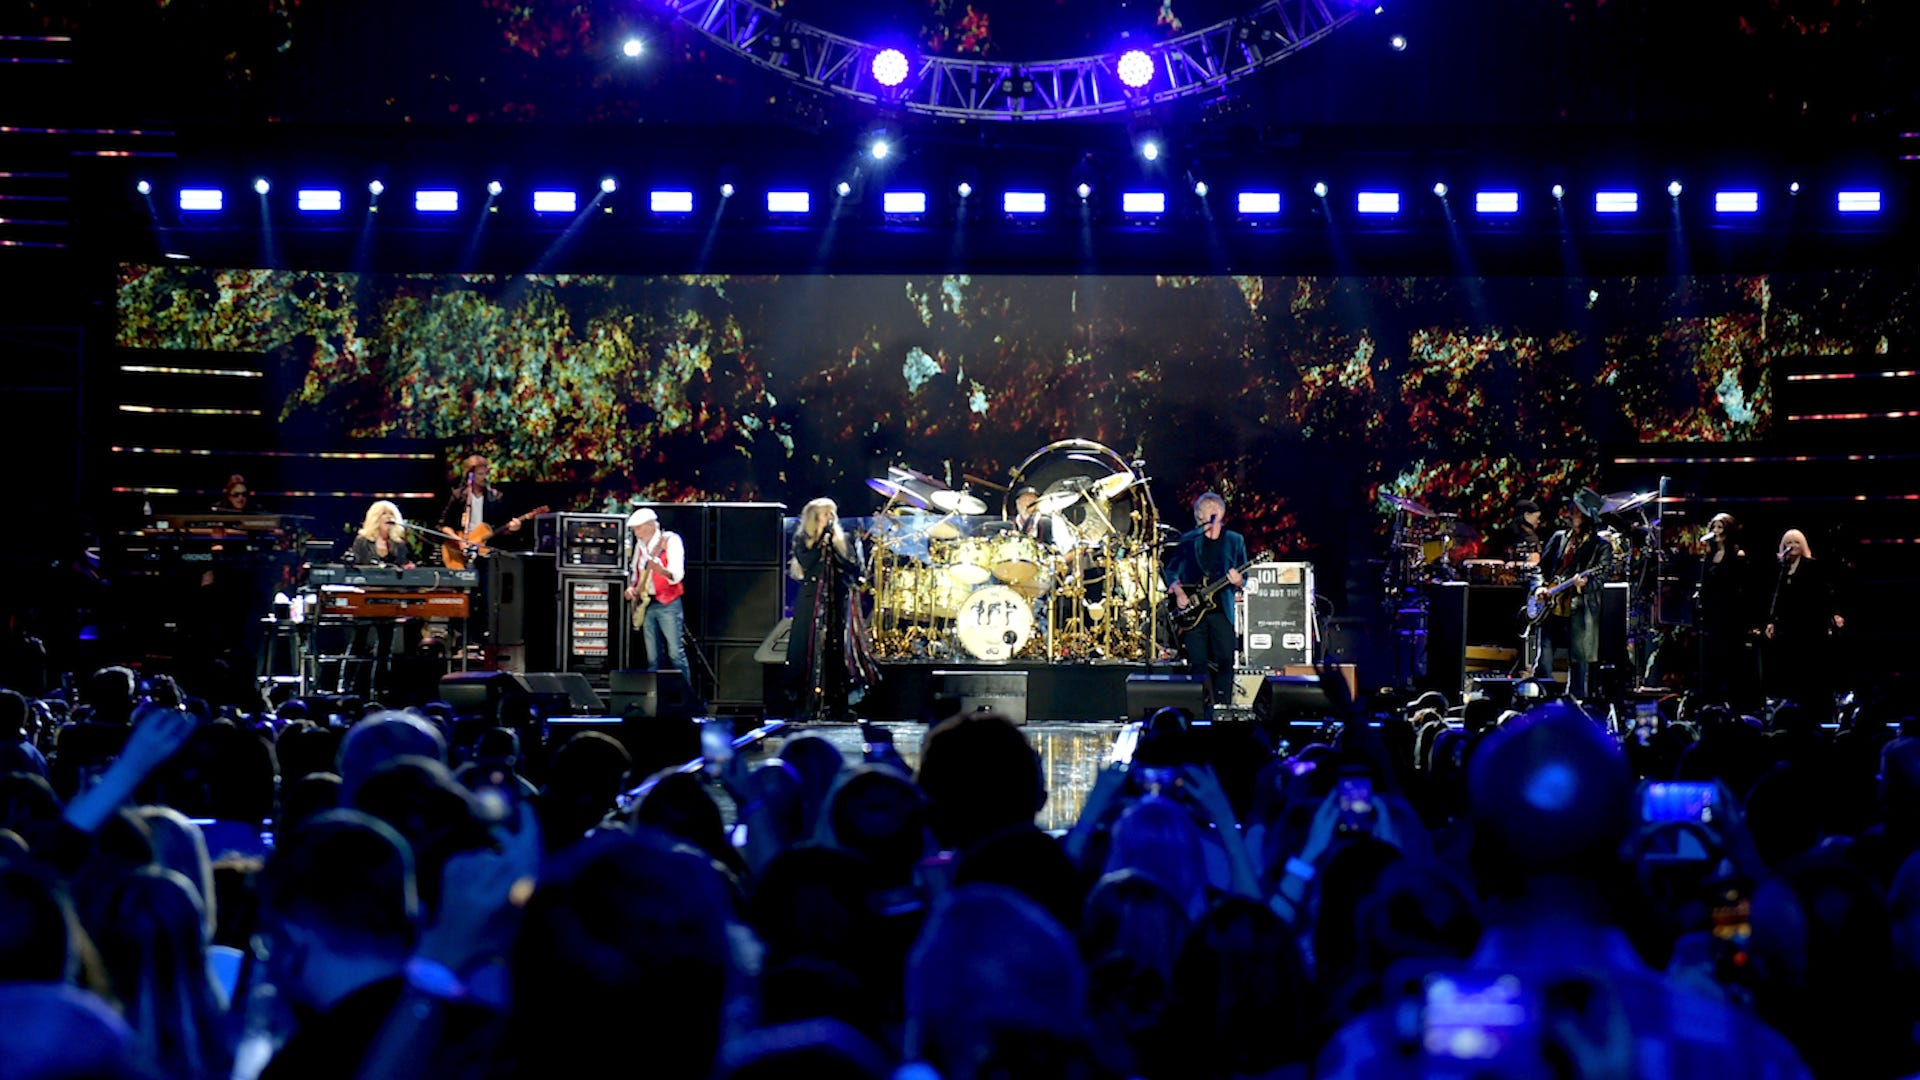 Def Leppard, Stevie Nicks among 2019 Rock Hall nominees